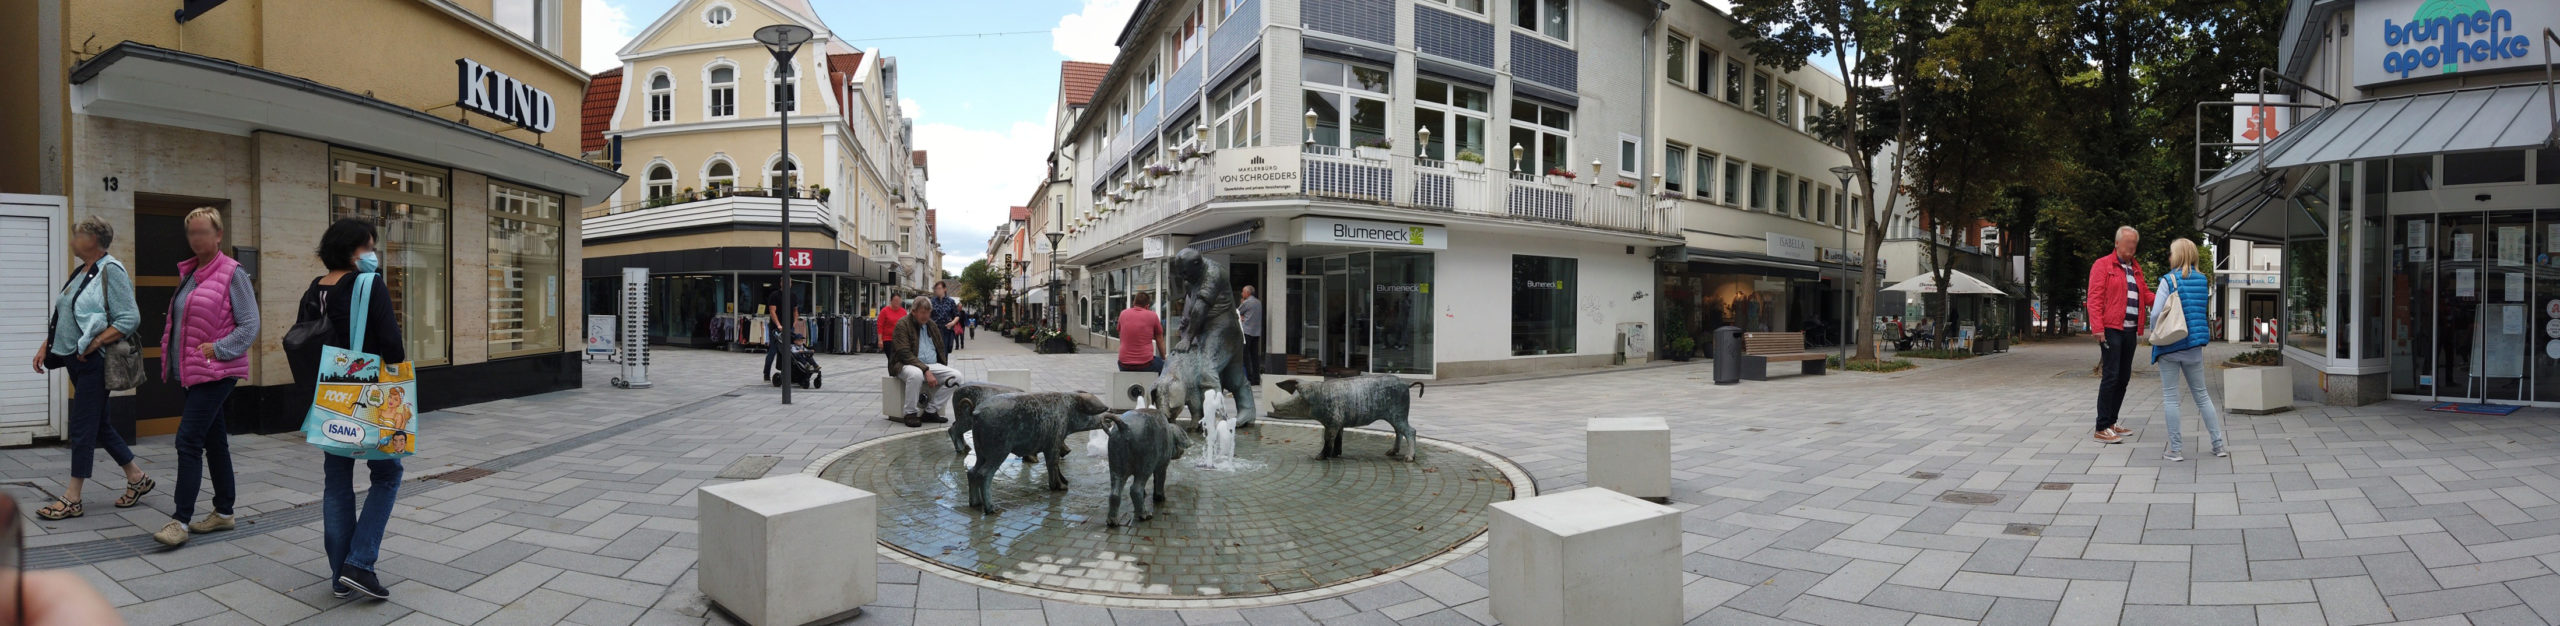 City Bad Oeynhausen